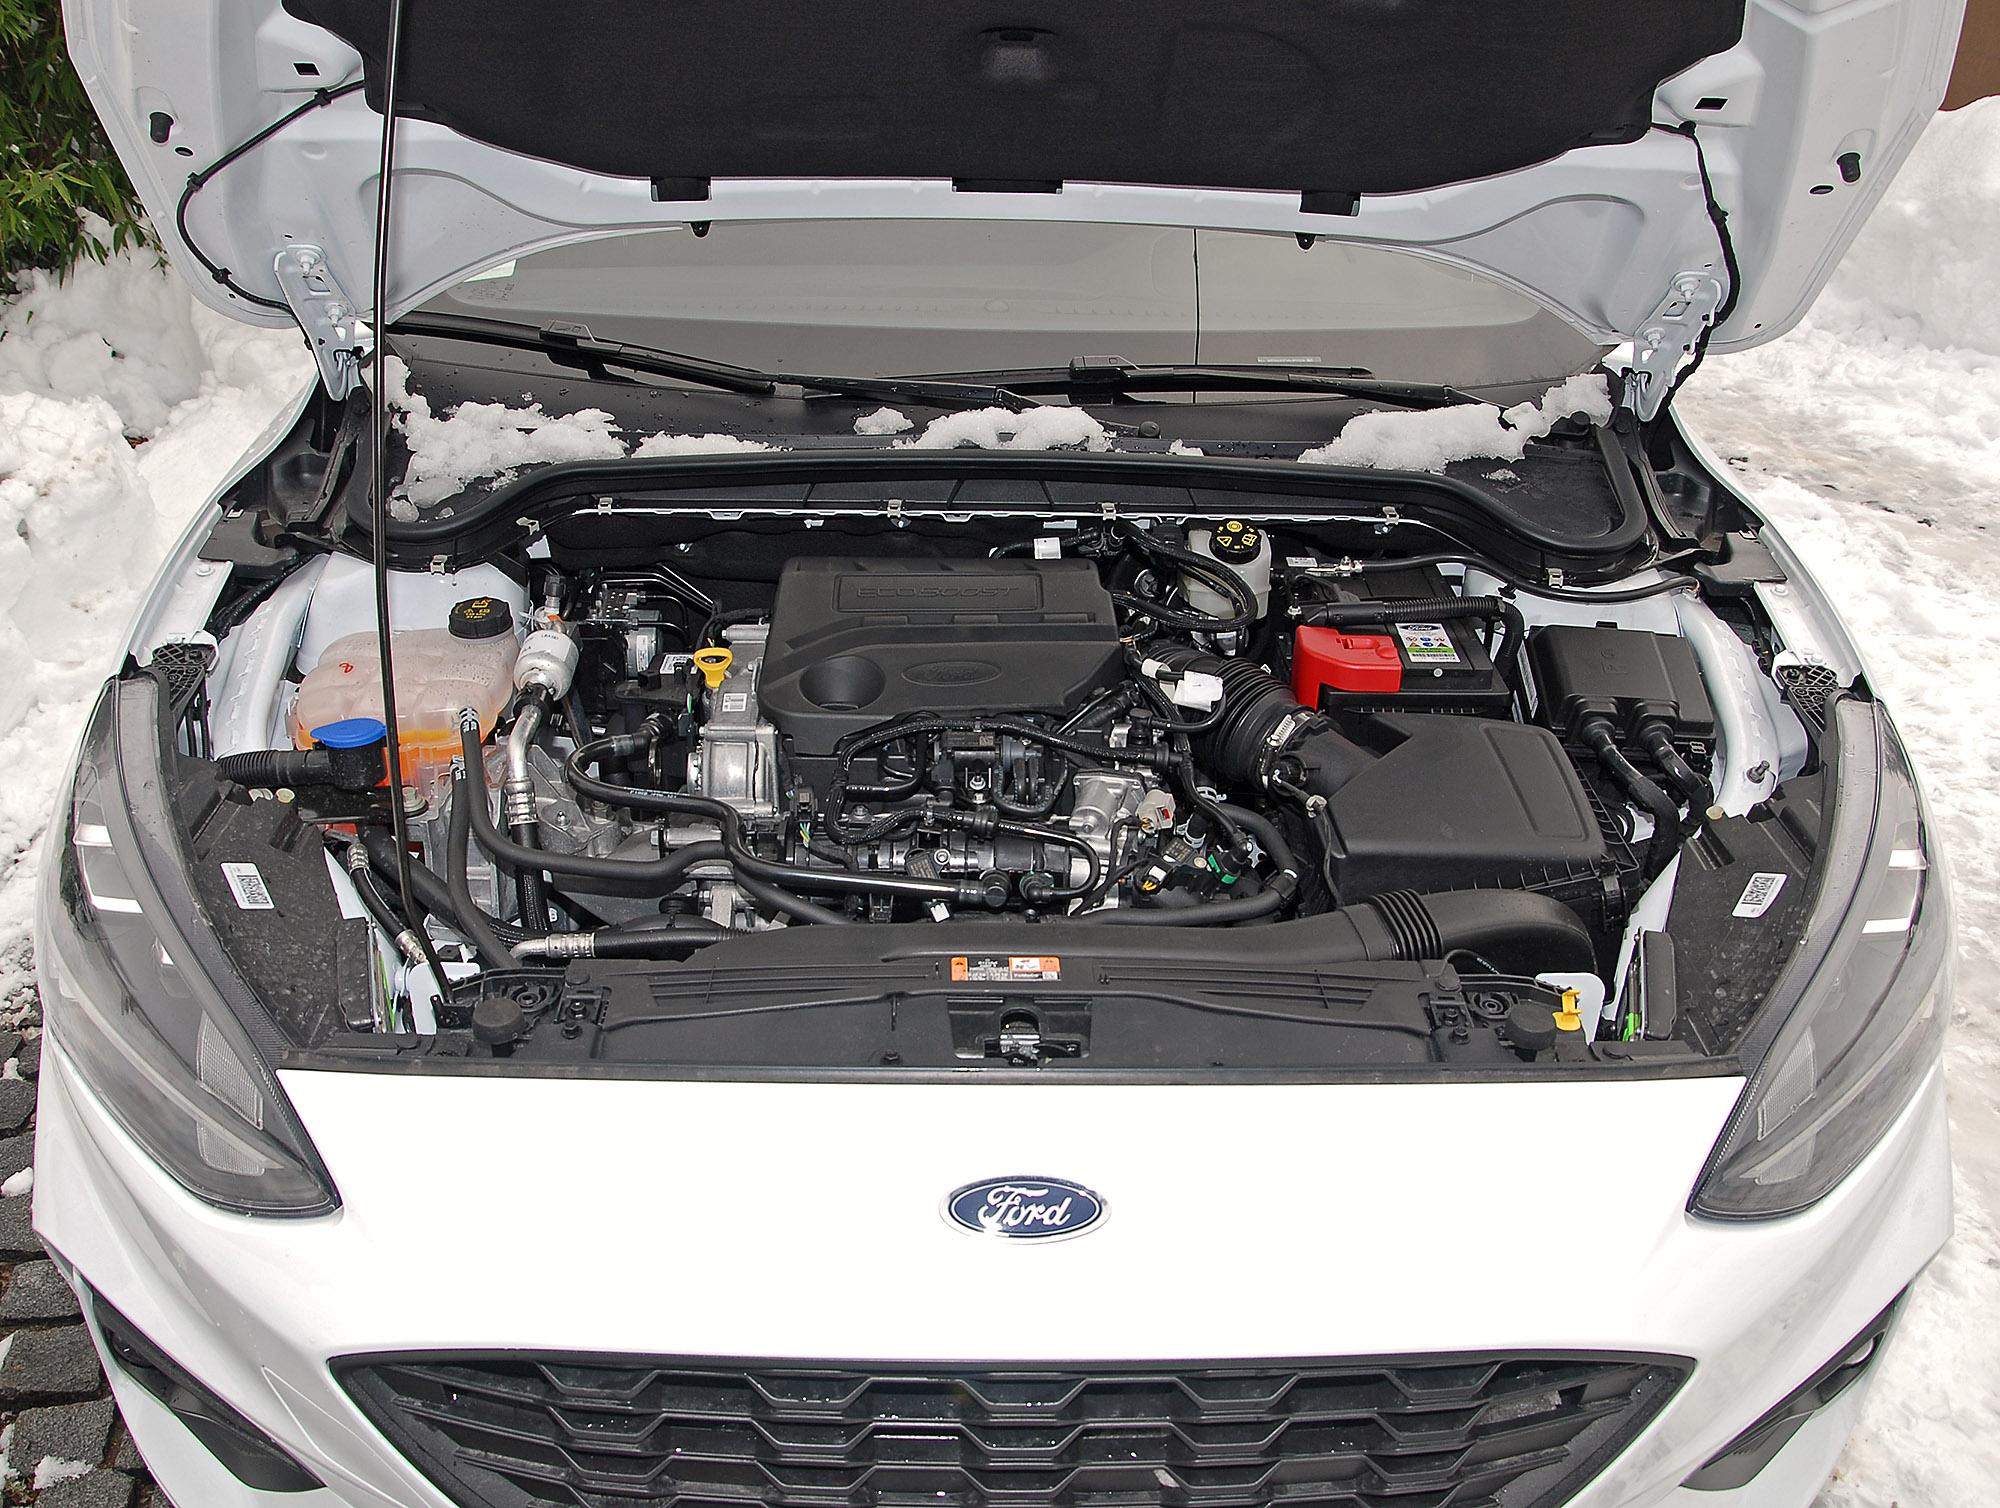 Ford Focus 1.0 EcoBoost 125 ST-Line